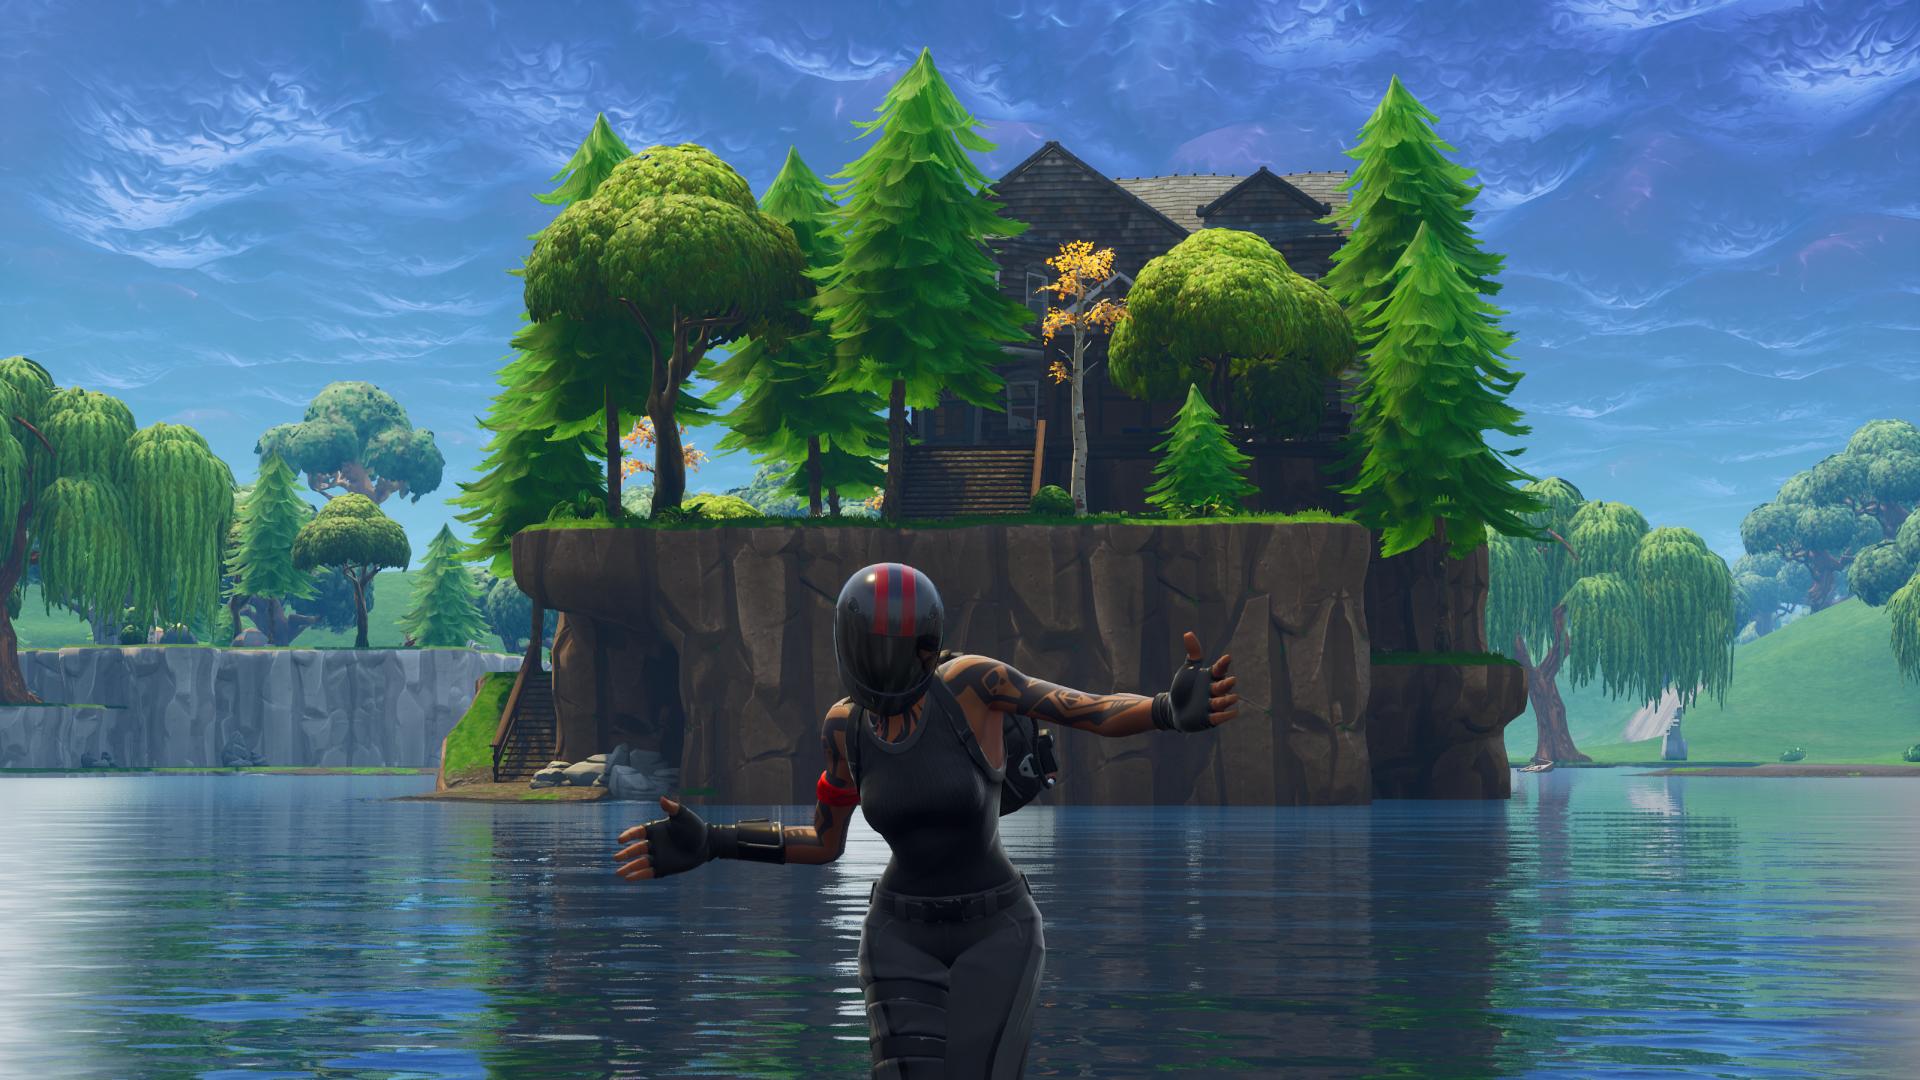 Fortnite dance off location